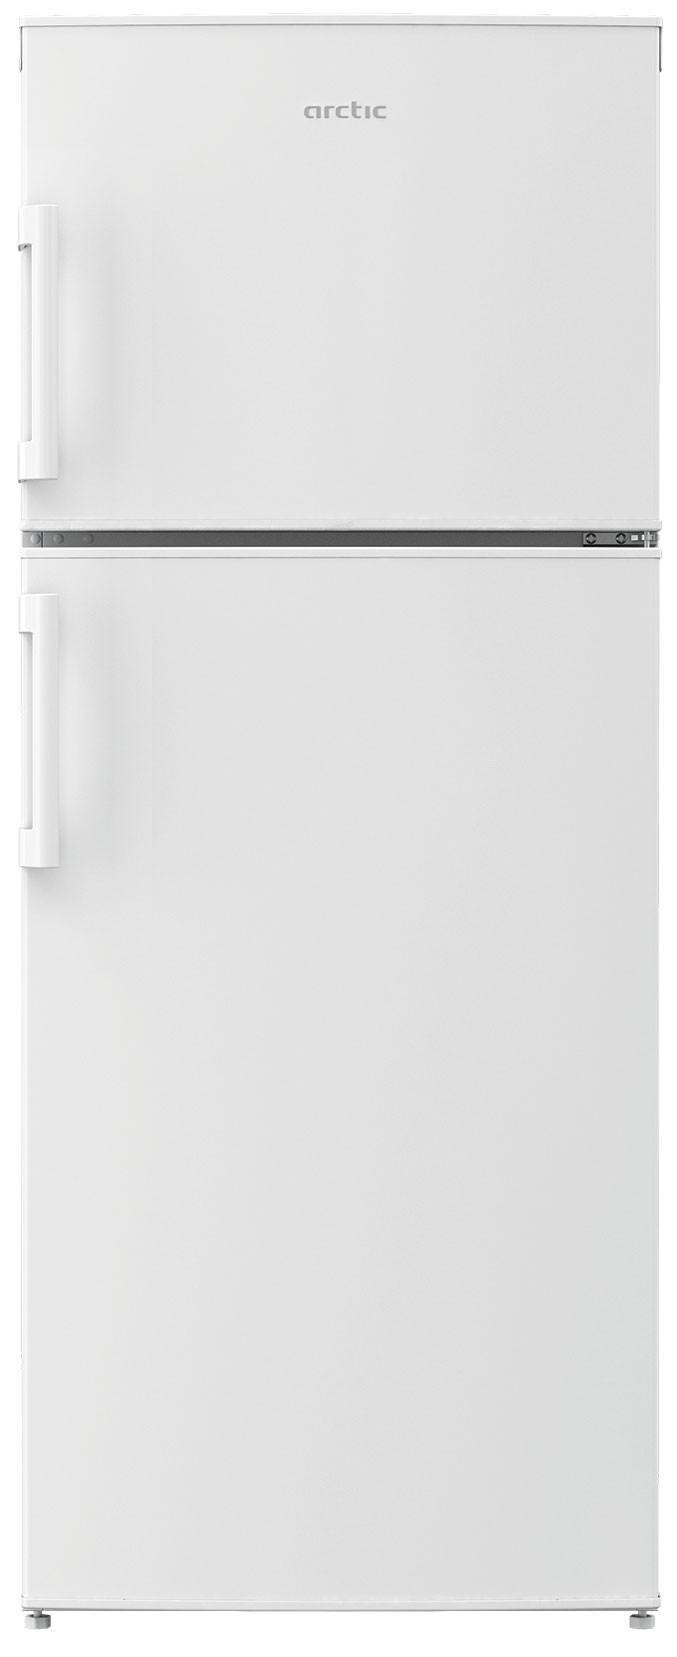 Frigider cu doua usi, Arctic, AND266+, 257 l, Clasa A+, H 151 cm, Arctic White